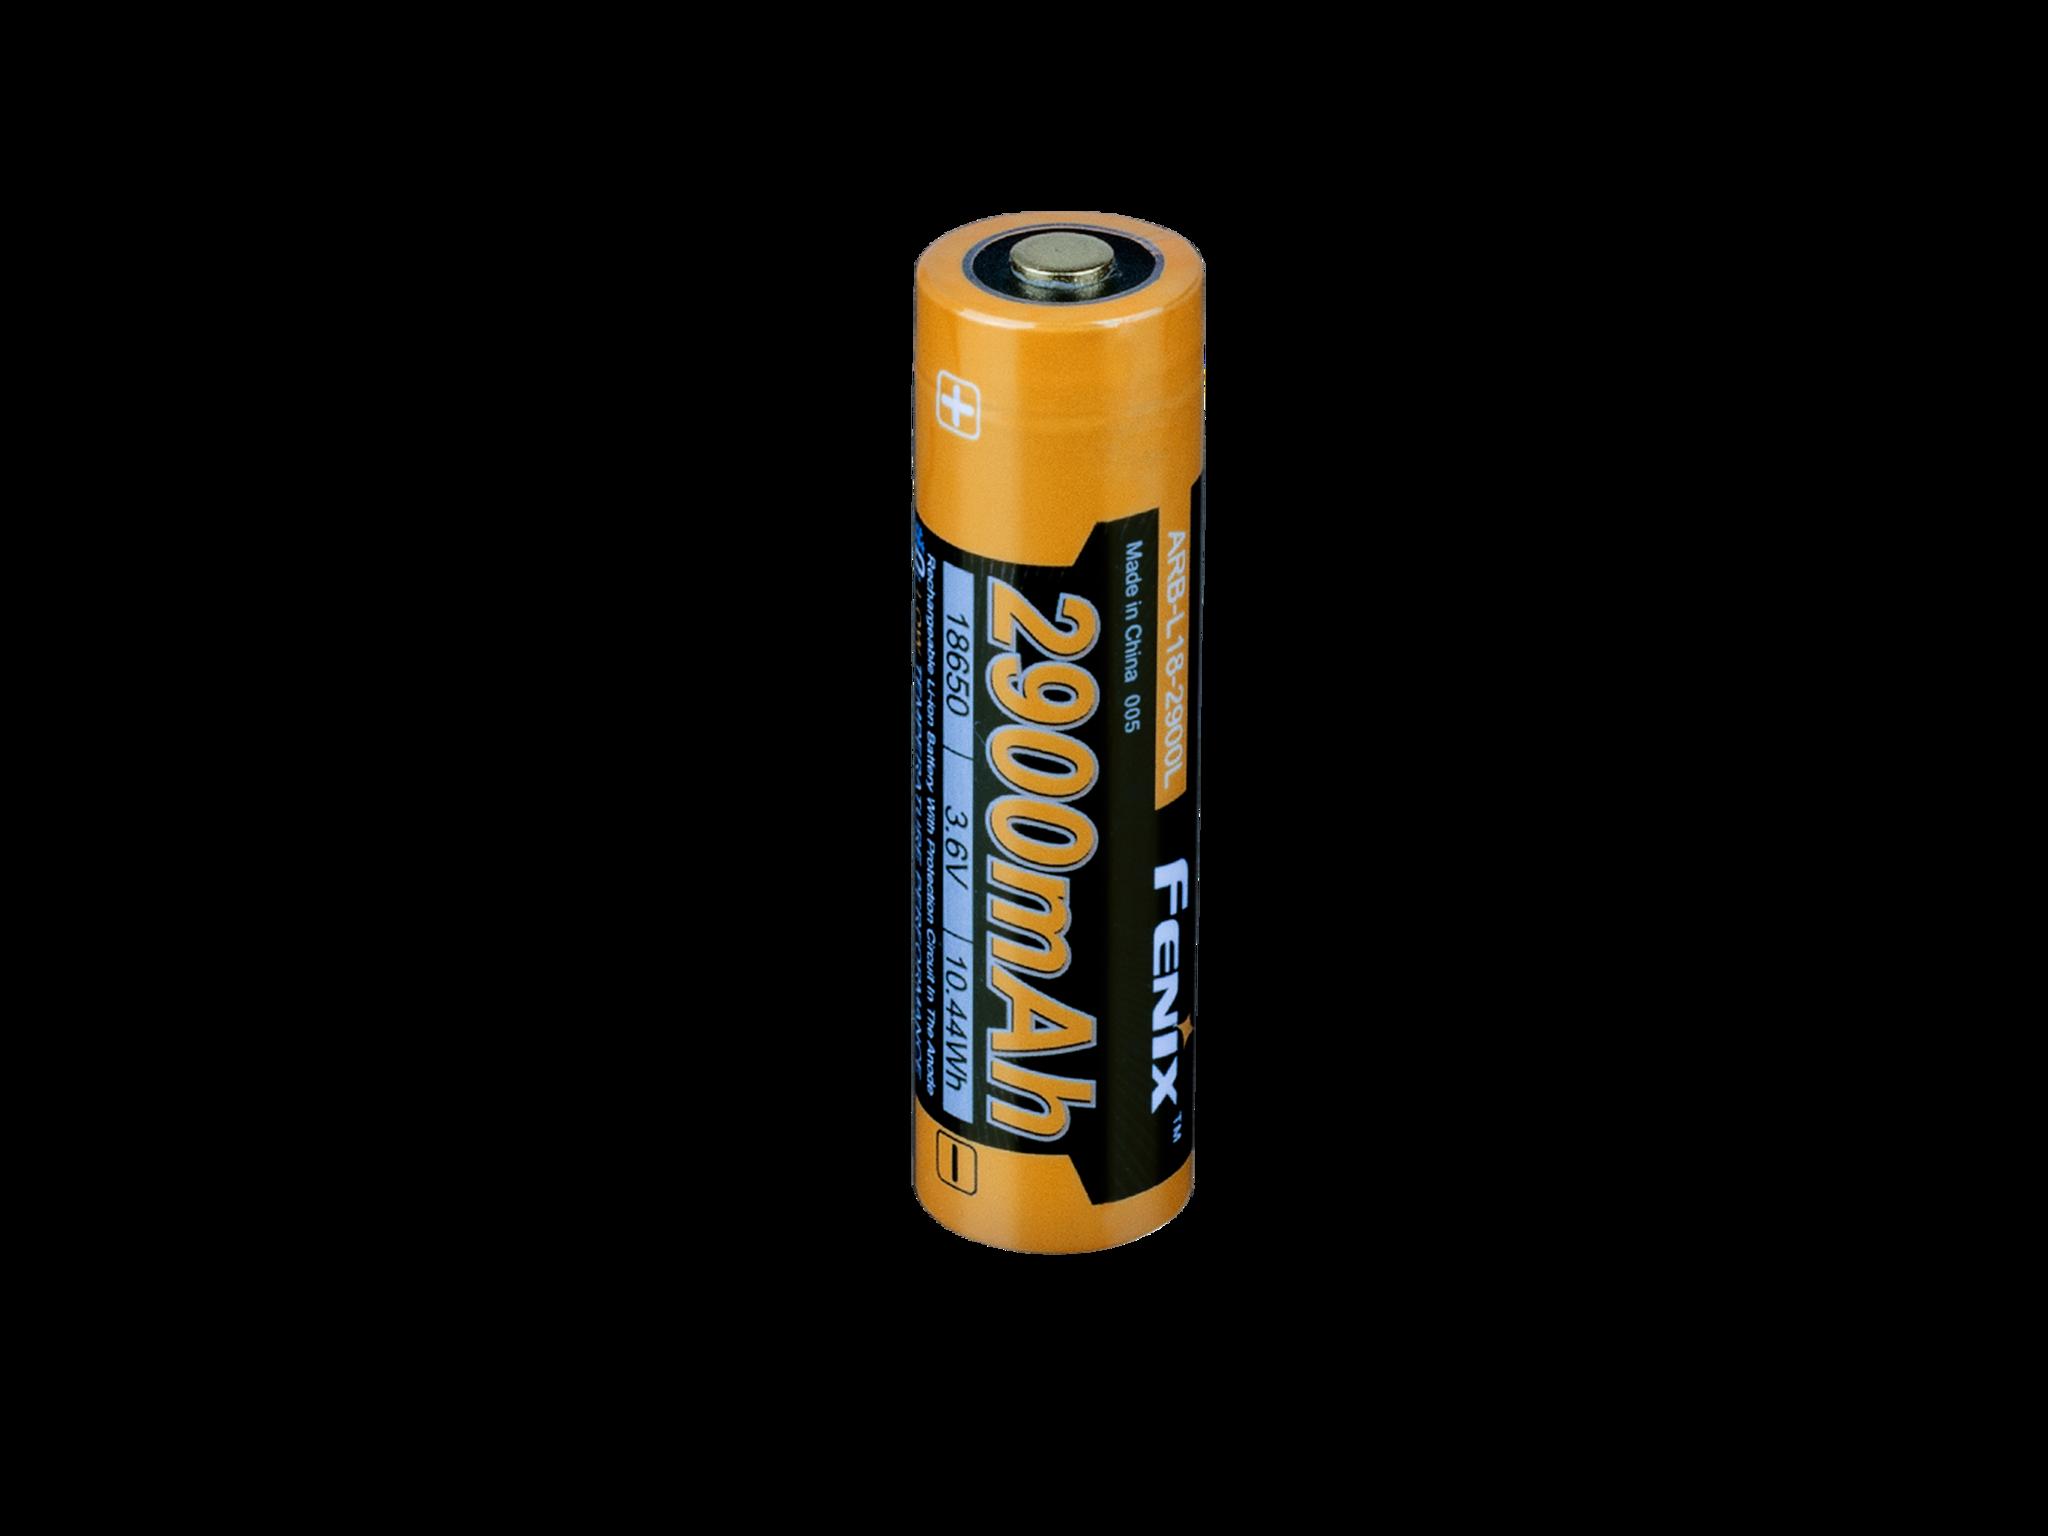 Аккумулятор 18650 Fenix 2900 mAh Li-ion морозостойкий цена